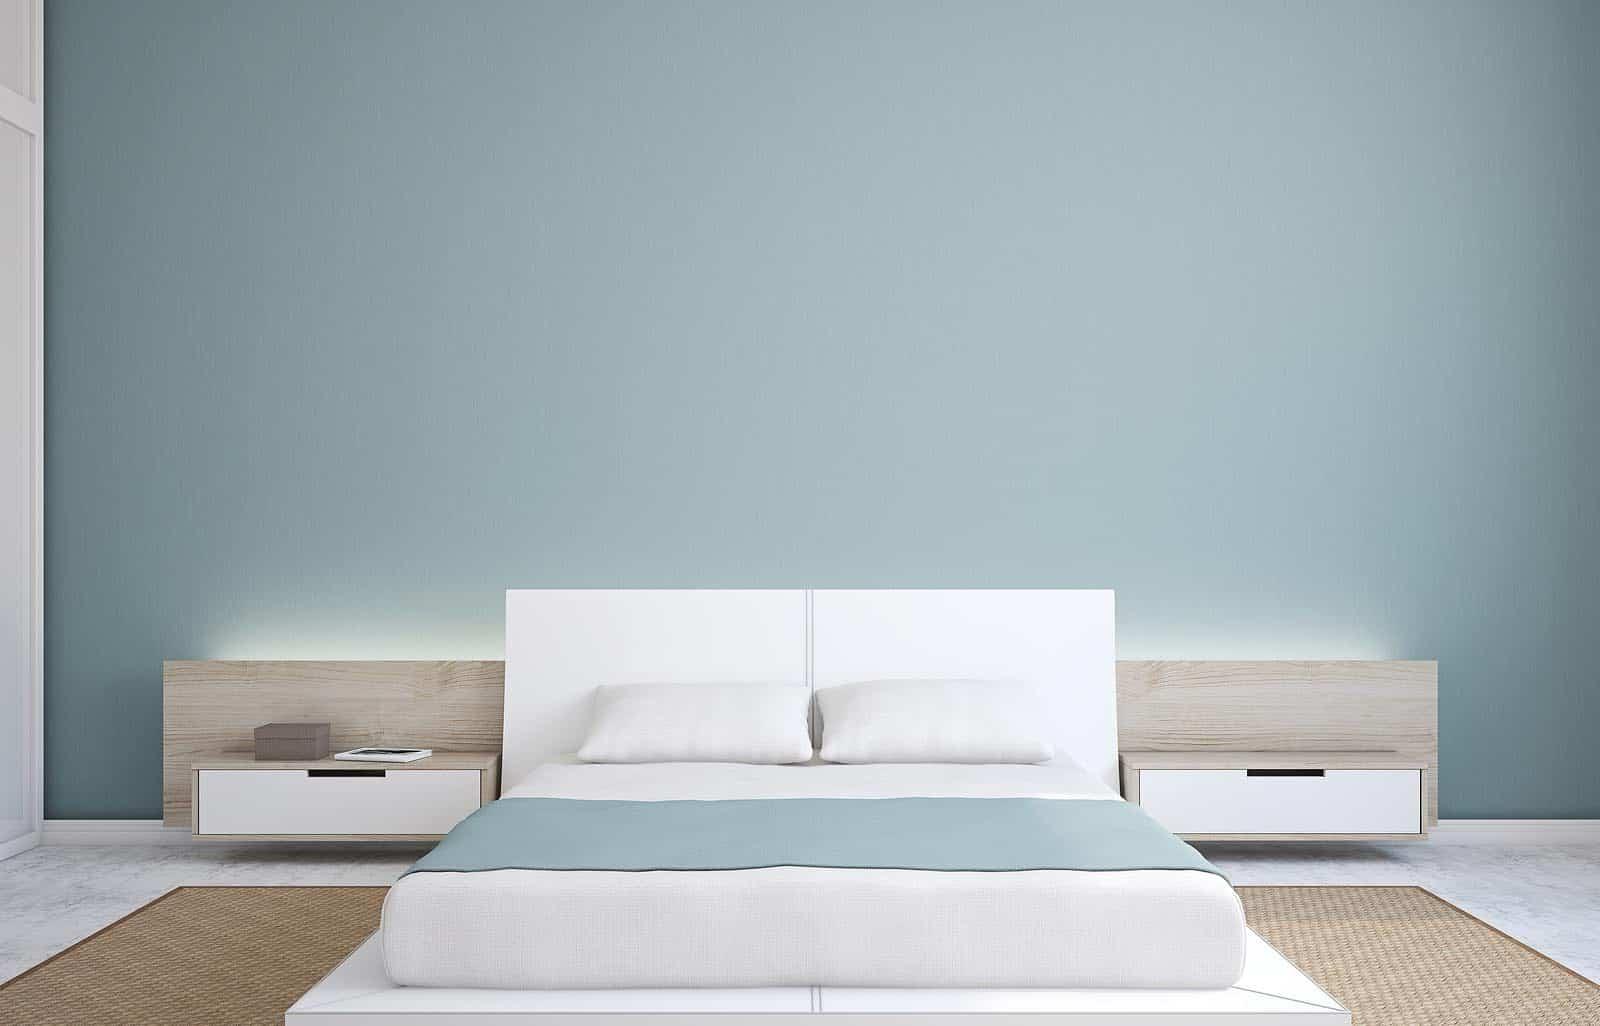 Light blue interior painted walls in minimalist bedroom